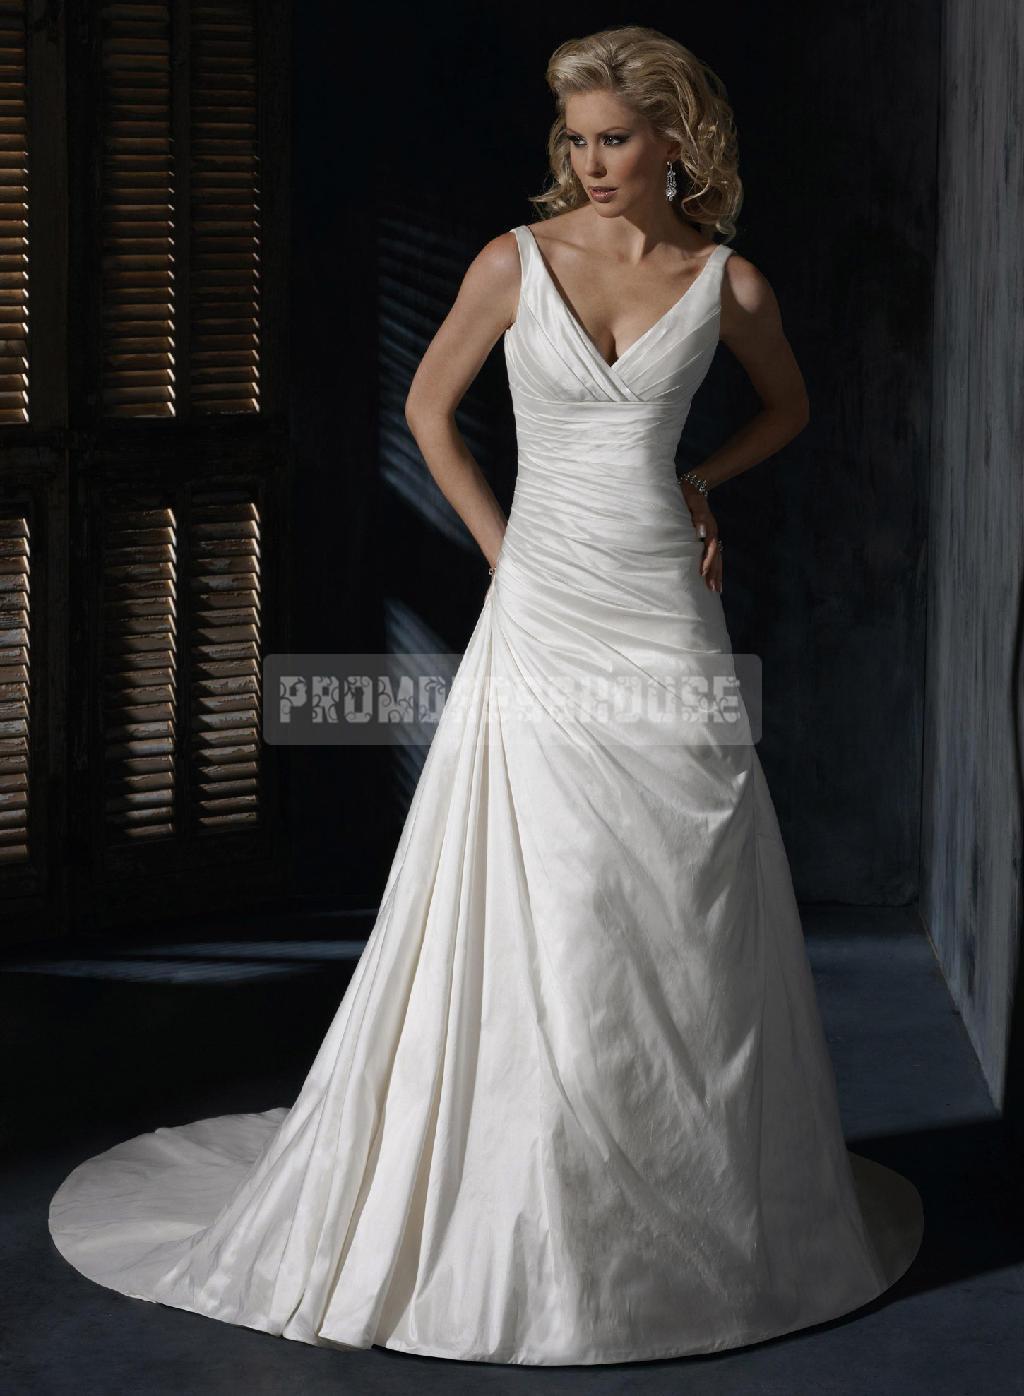 V-neck Taffeta Chapel Train Ruching Lace-up Wedding Dress - Promdresshouse.com